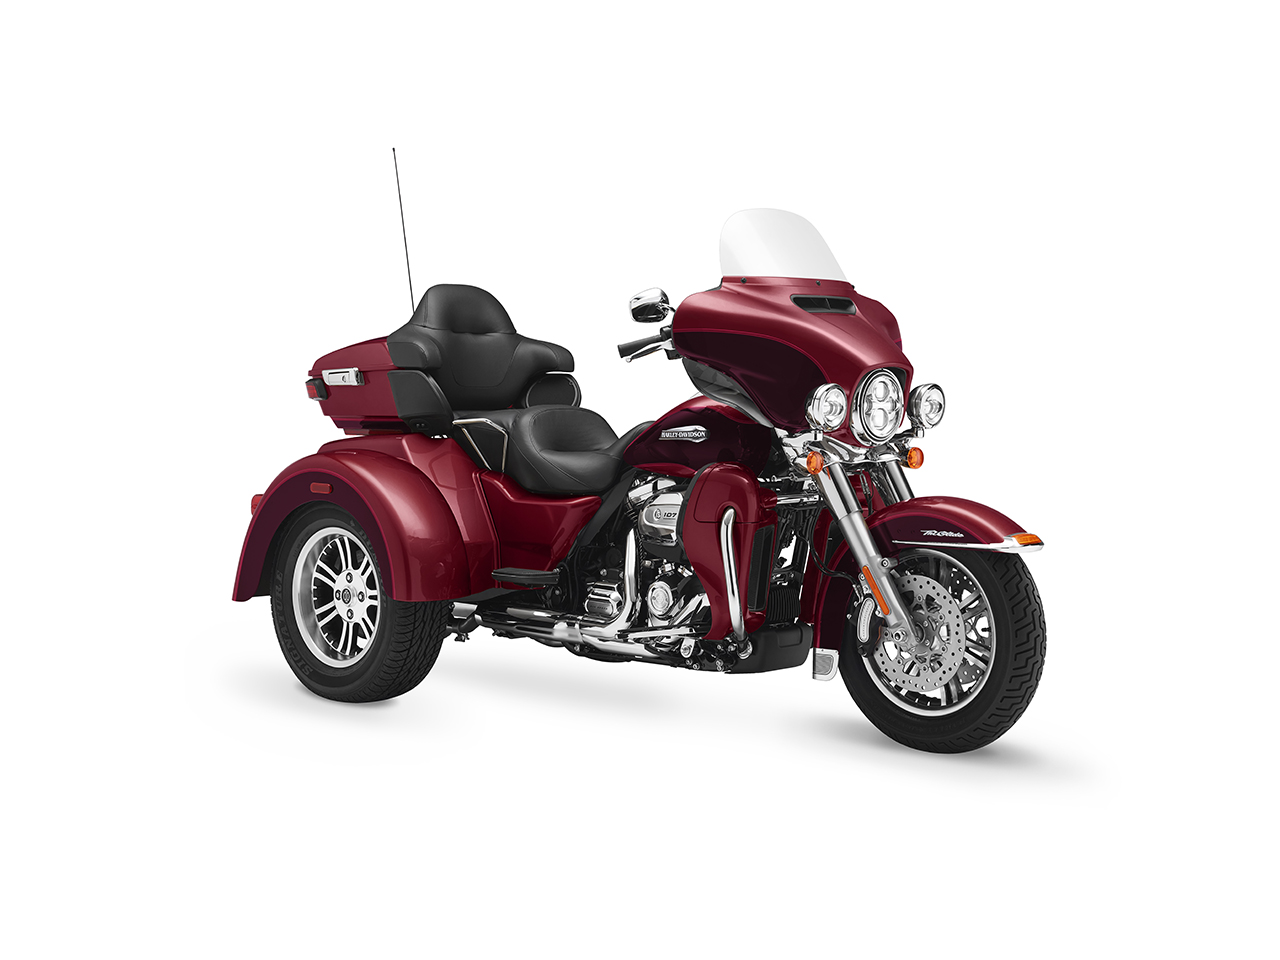 2018 Harley-Davidson Tri Glide Ultra Image